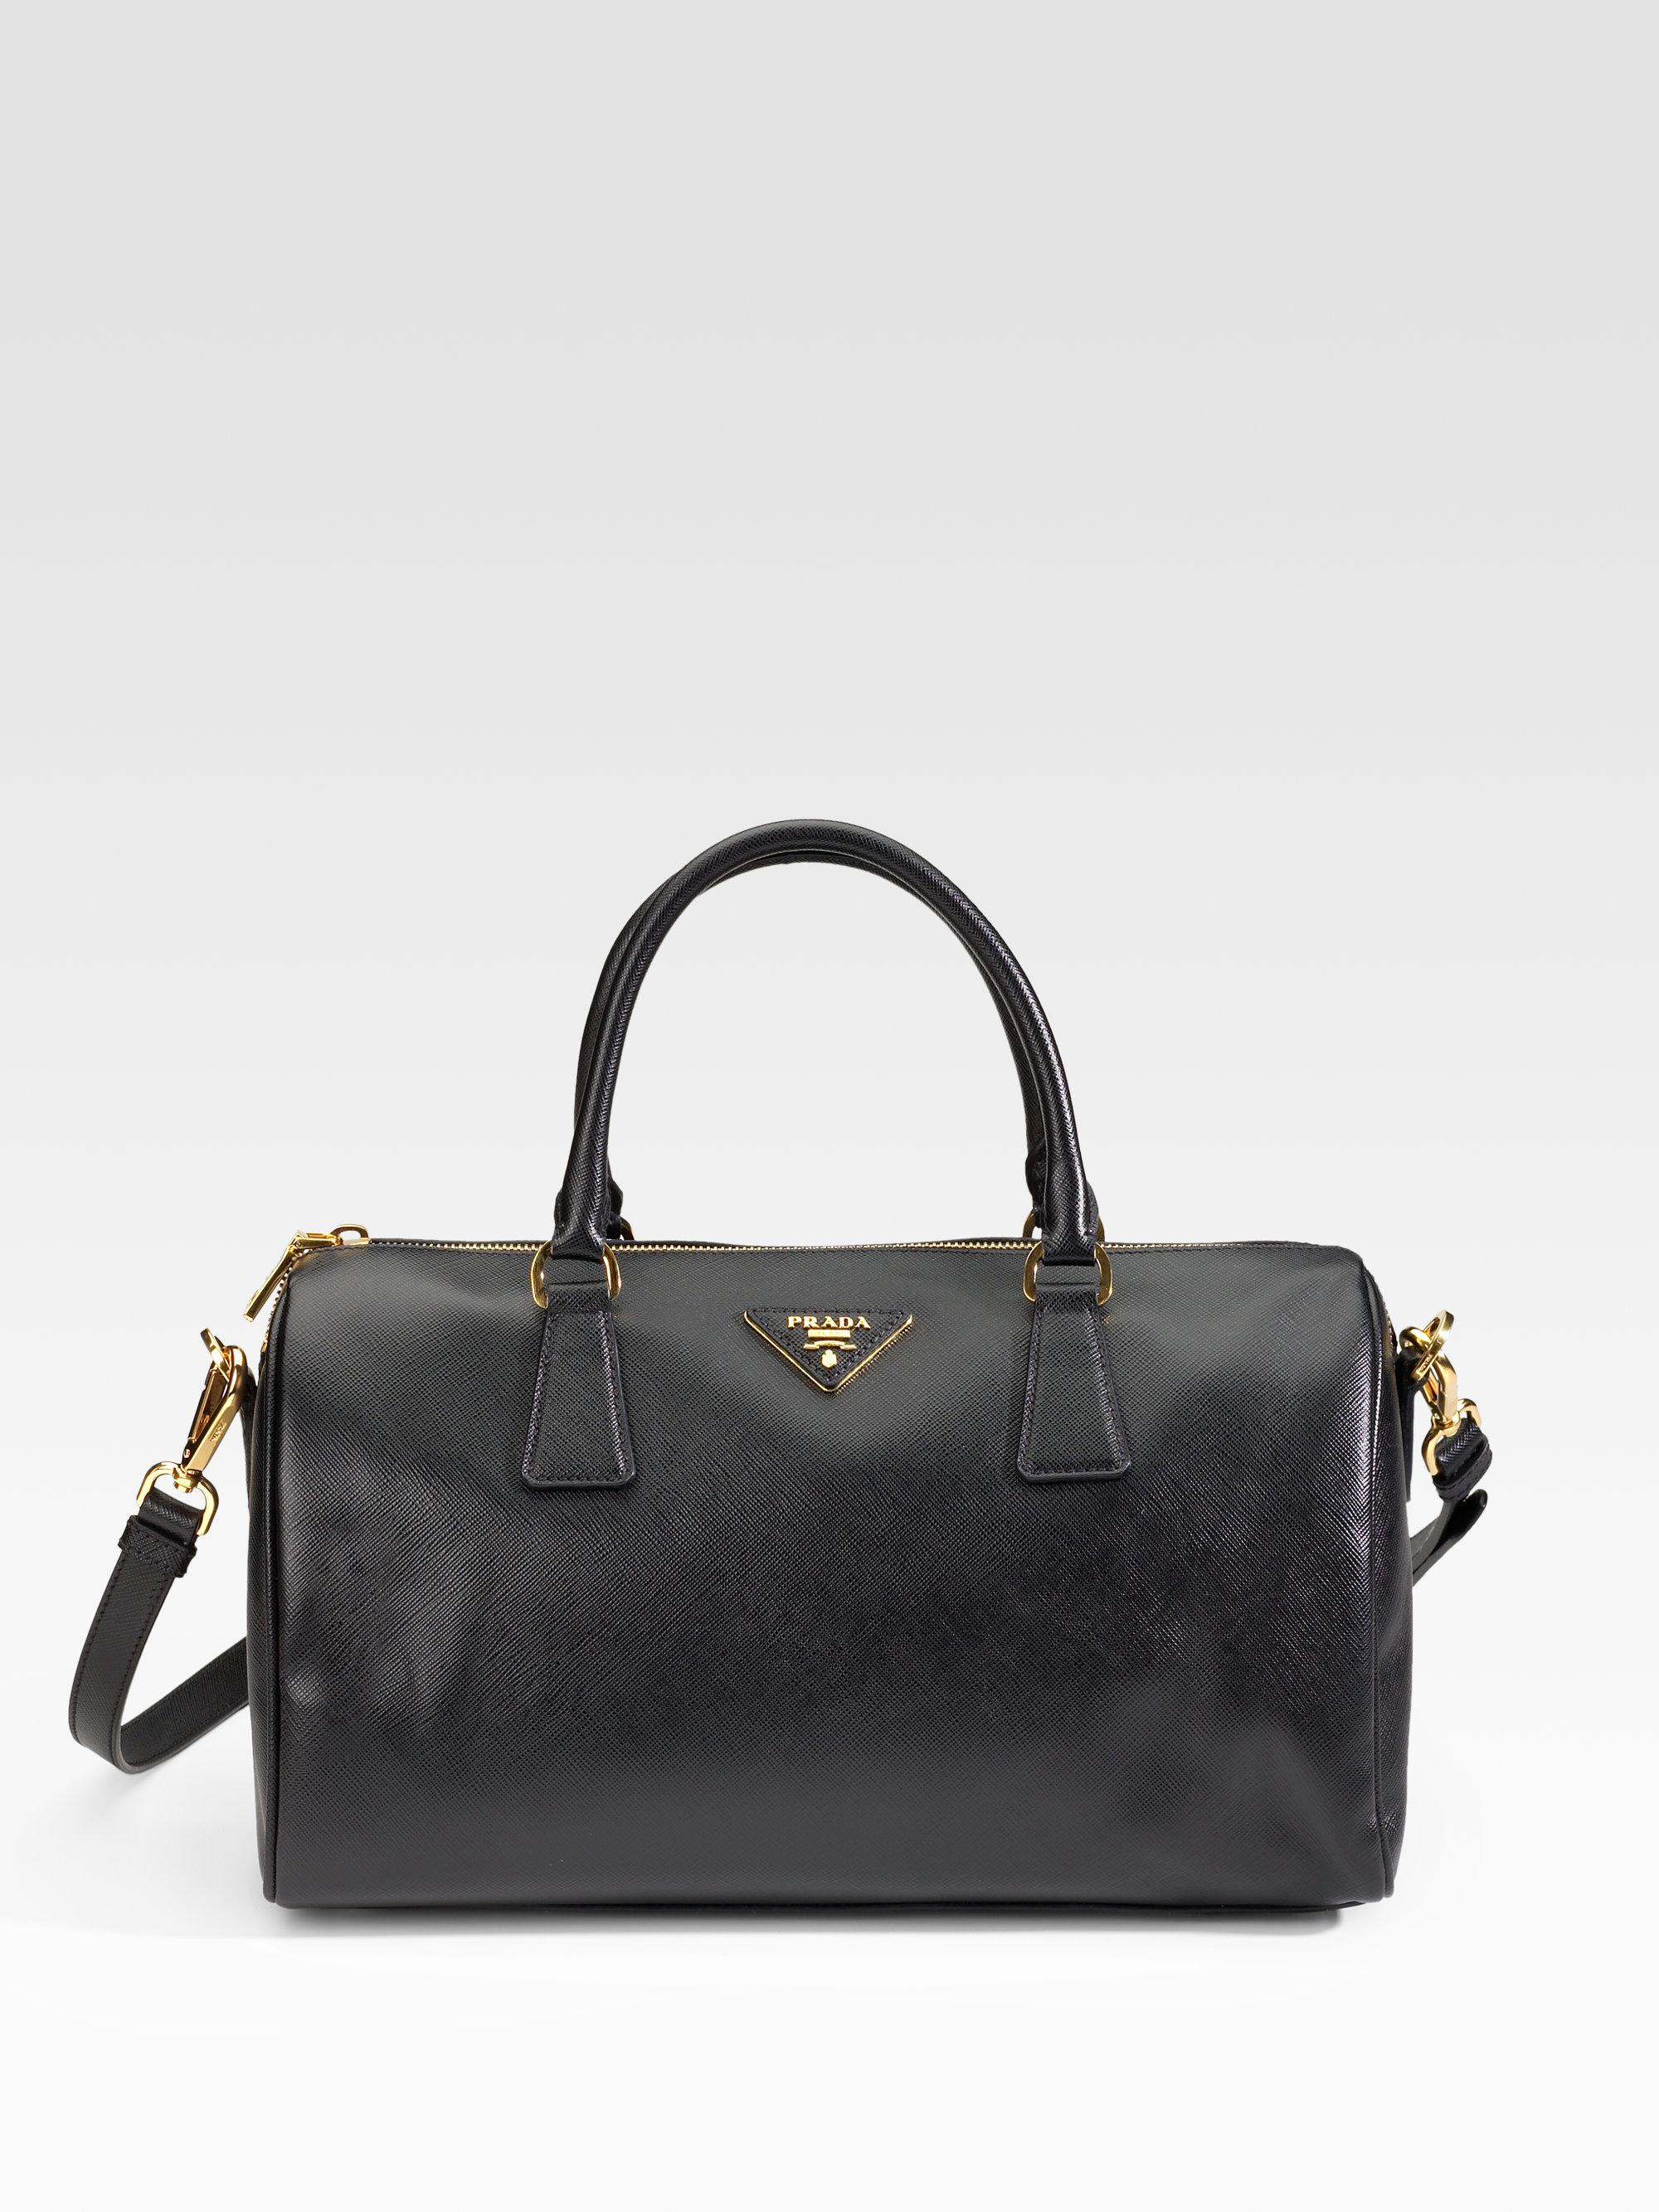 80c04b394d3 Lyst - Prada Saffiano Lux Boston Bag in Black